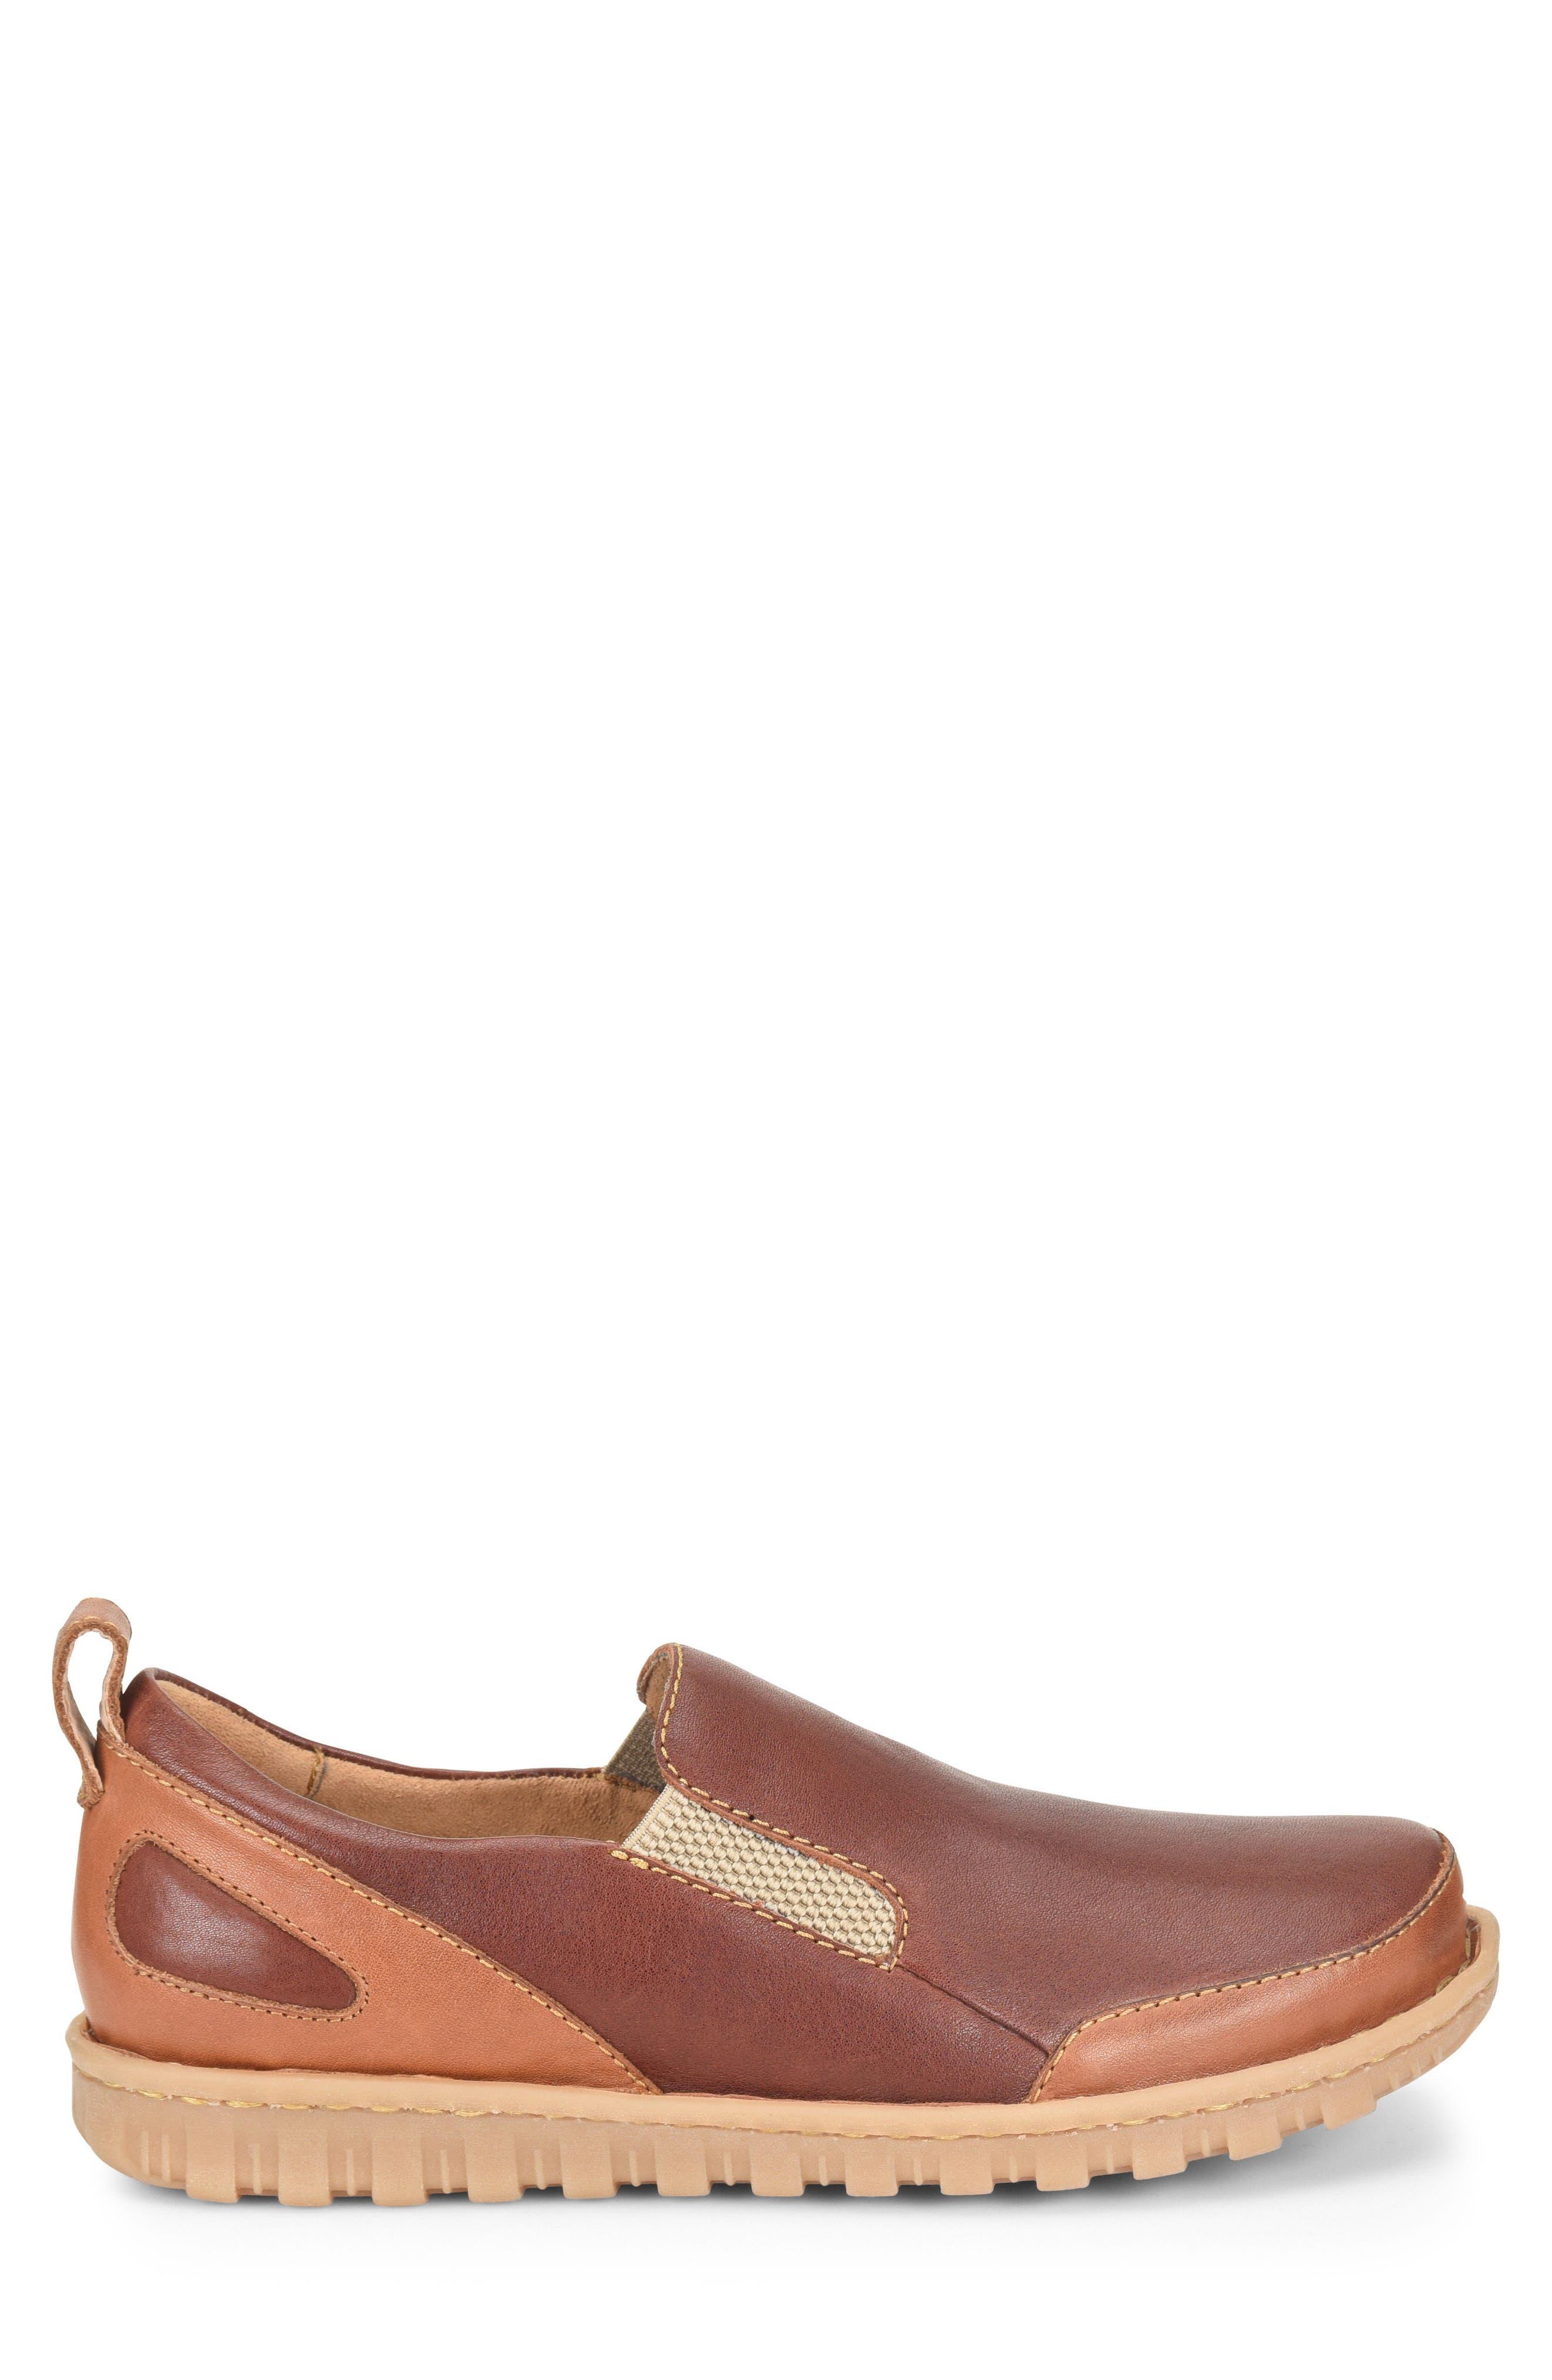 Pepper Slip-On,                             Alternate thumbnail 6, color,                             Brown/ Rust Leather